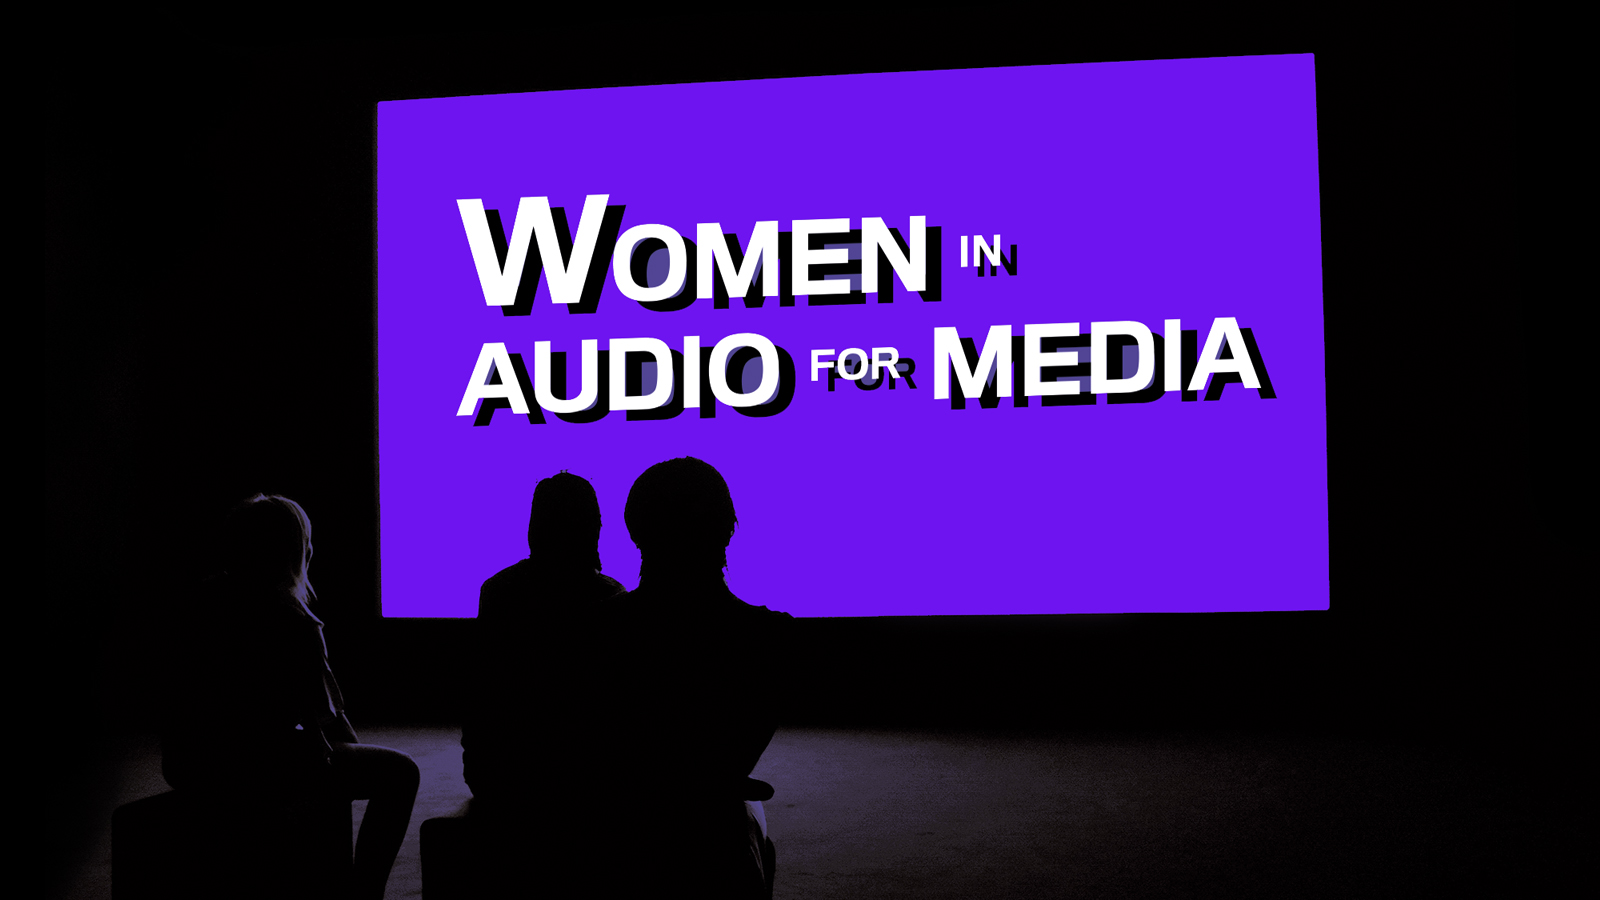 Women in Audio for Media